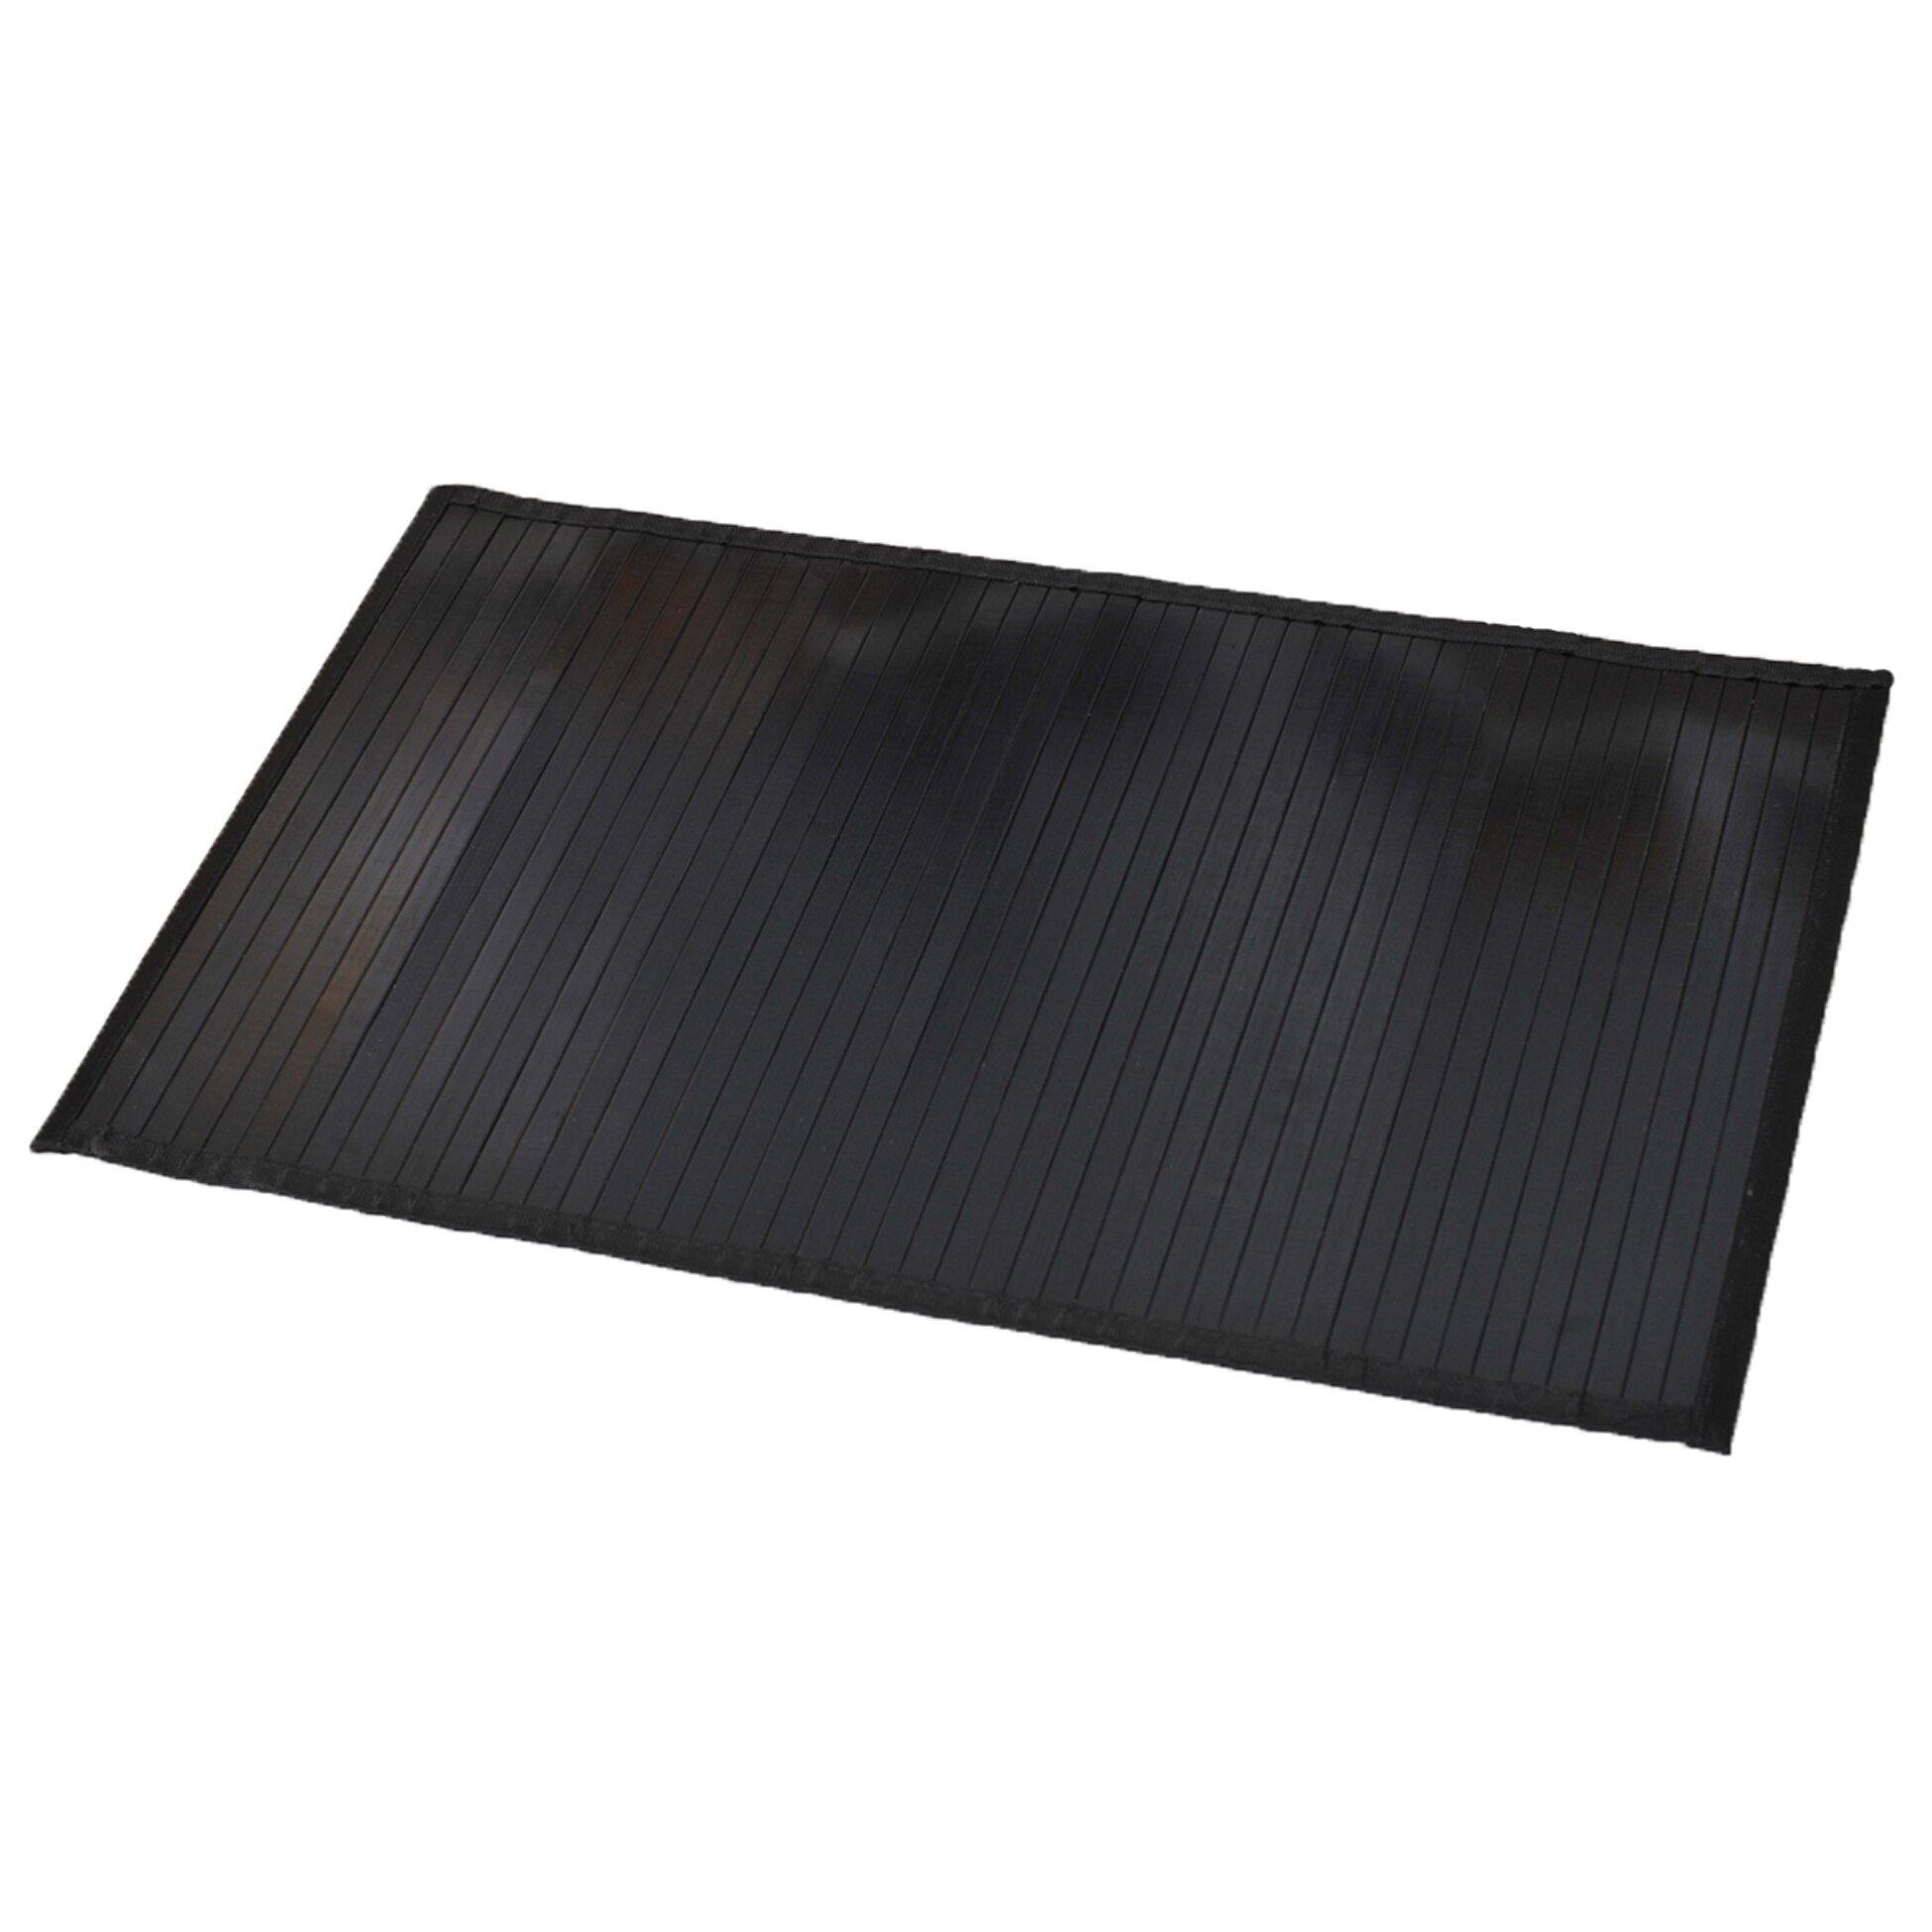 Anti Slippery Mat : Evideco anti slippery bath mat reviews wayfair